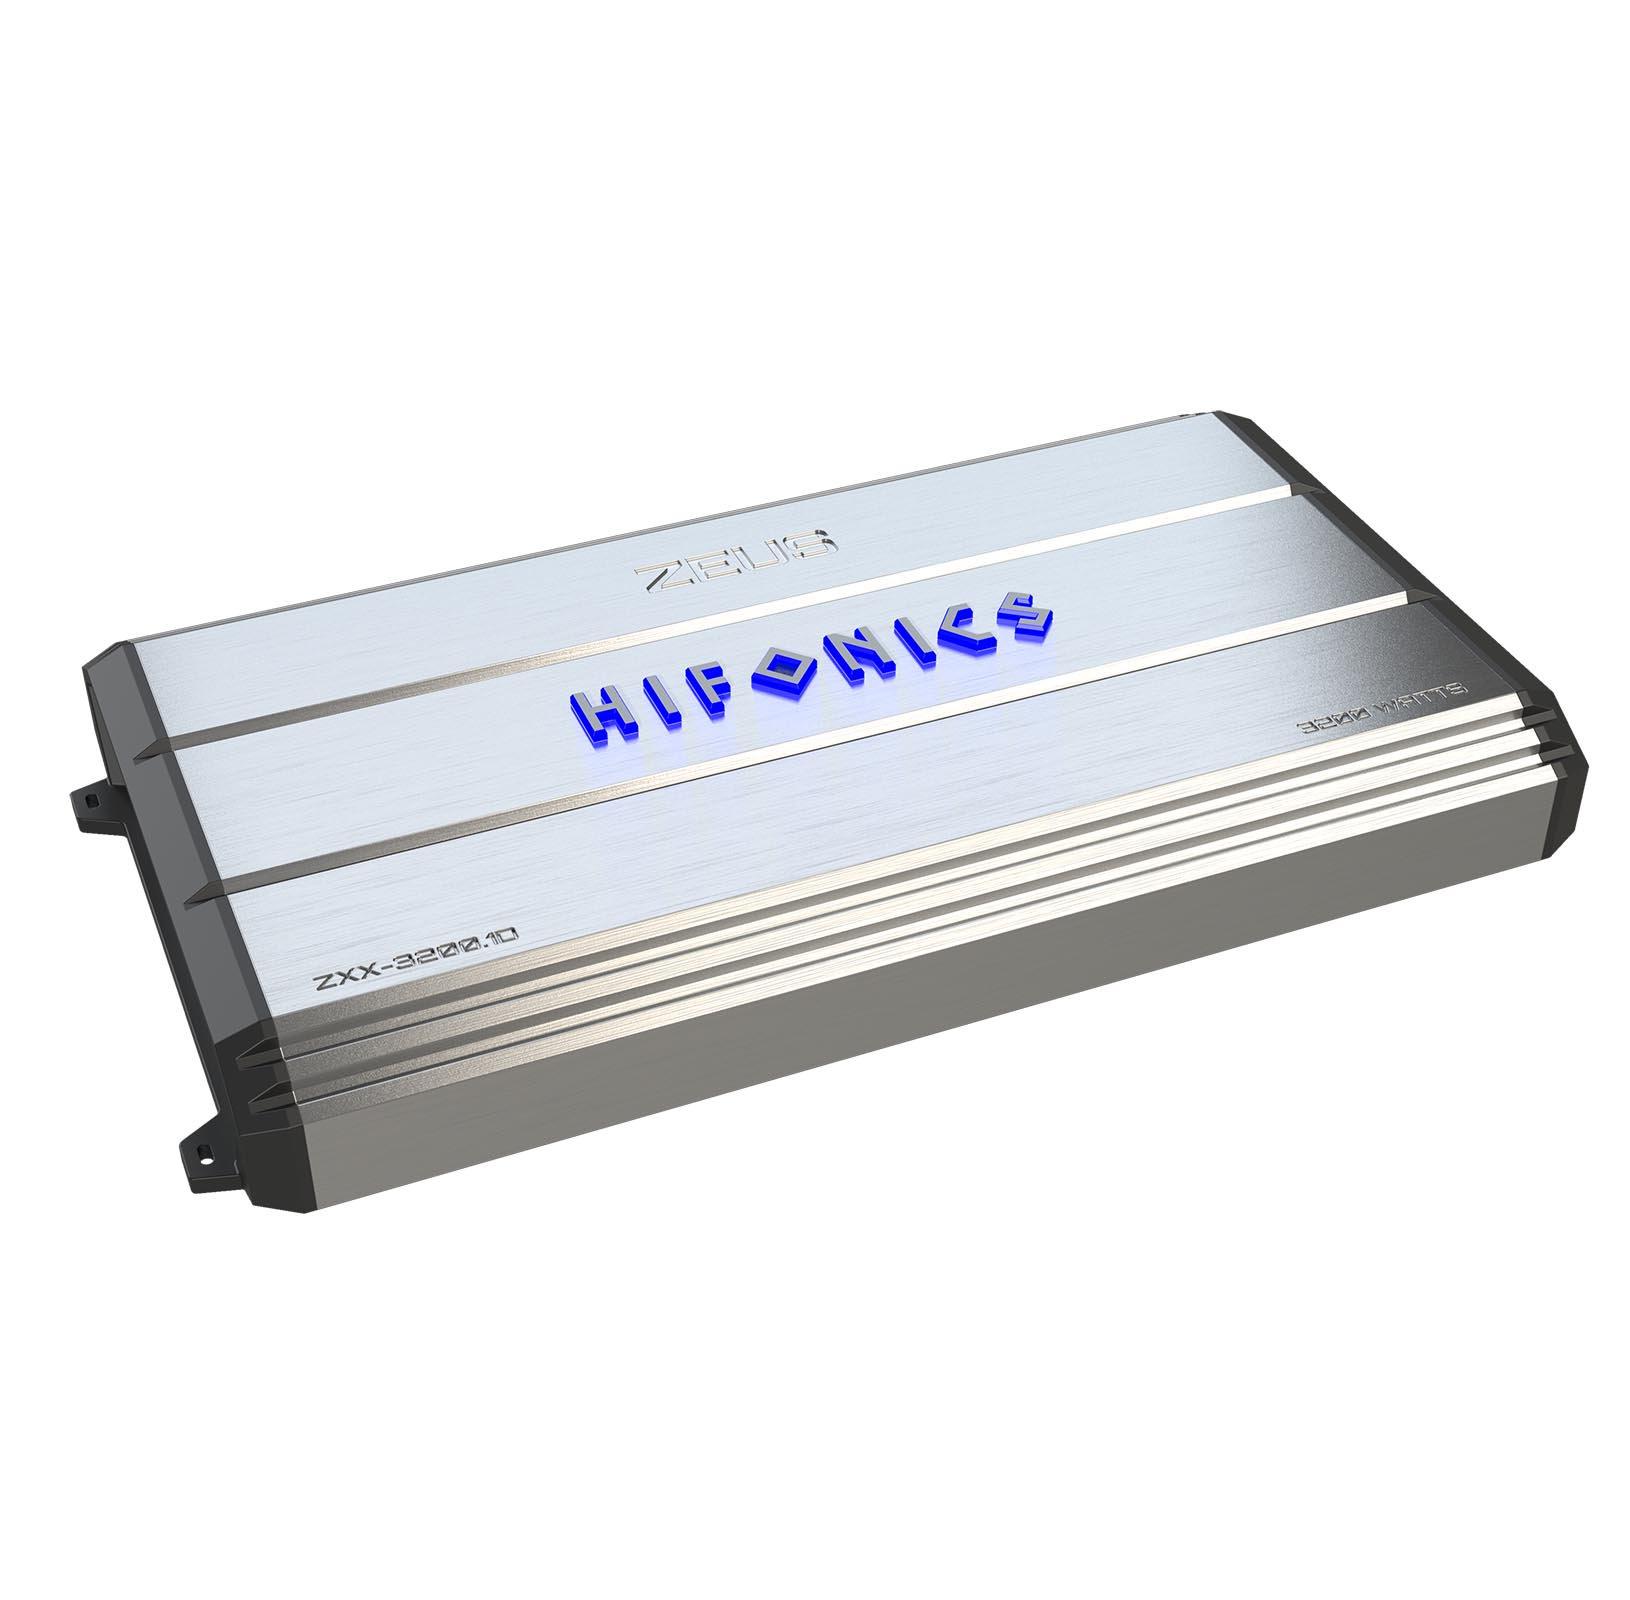 Hifonics Zeus 3200-Watt Max Class D Monoblock Car Audio Amplifier | ZXX-3200.1D